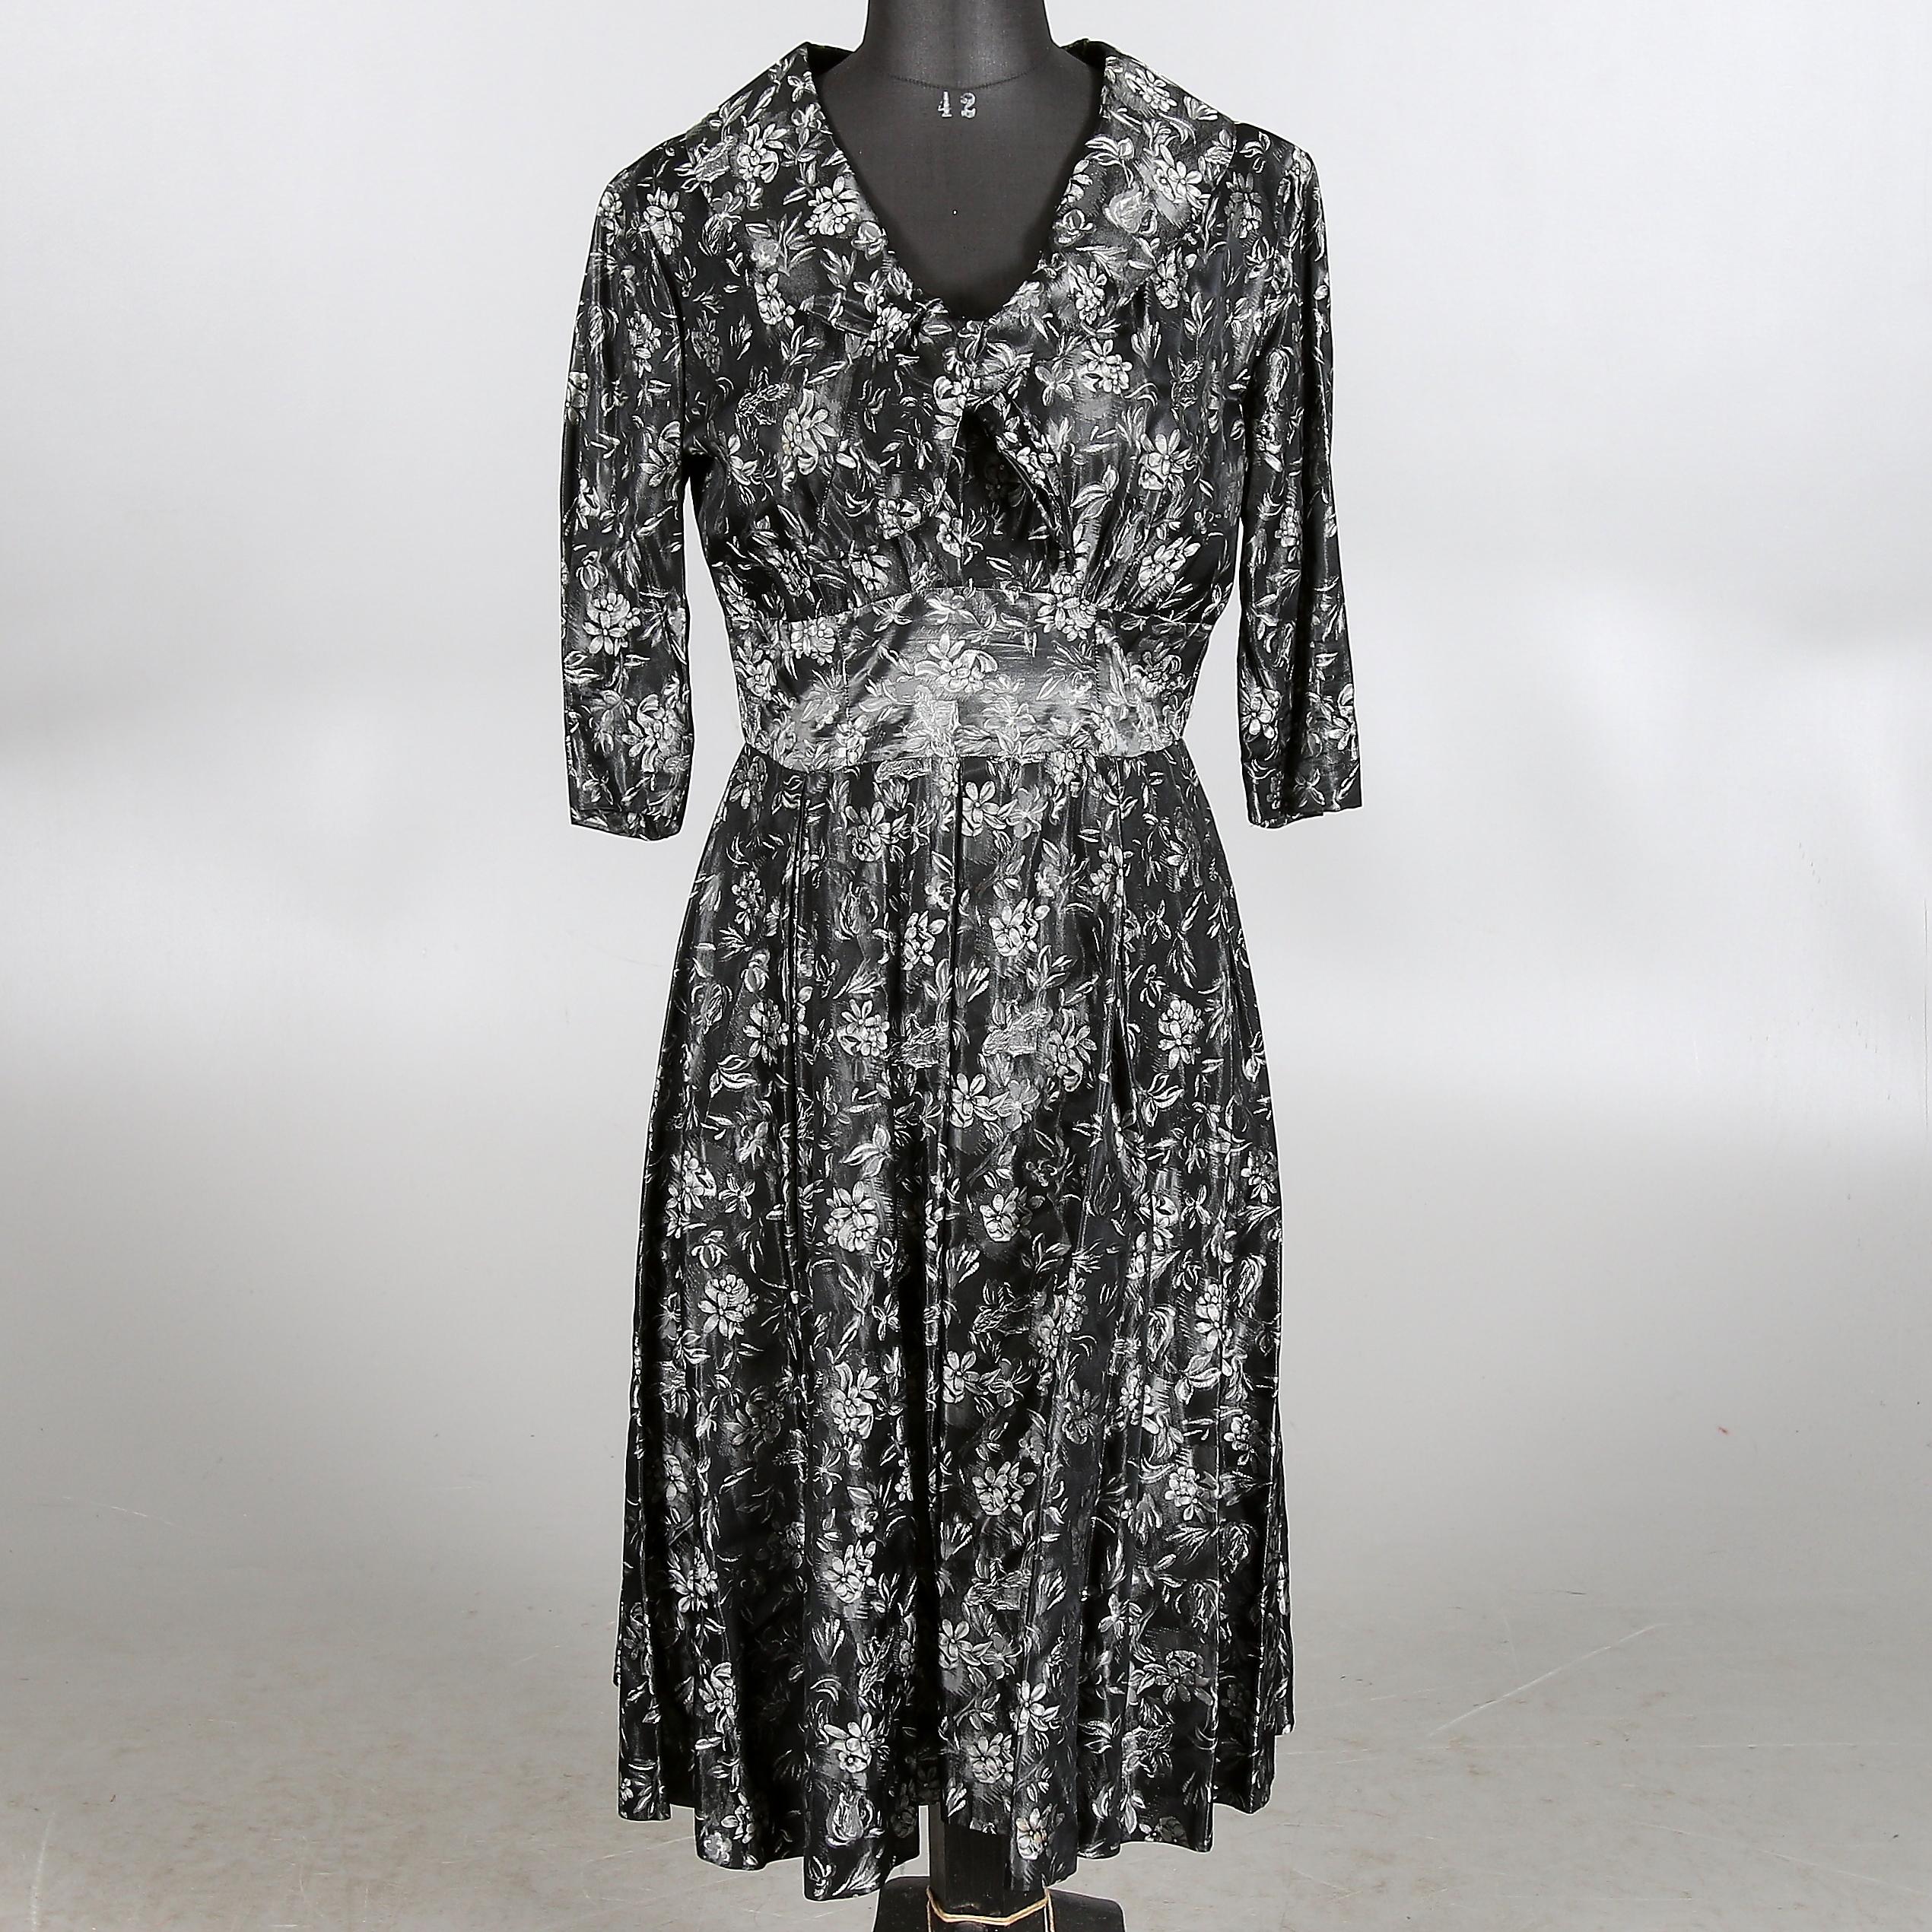 926fbec85d58 KLÄNNING, svart silverbrokad, 1950-tal. Strl. 36/38. Vintage clothing &  Accessories - Auctionet